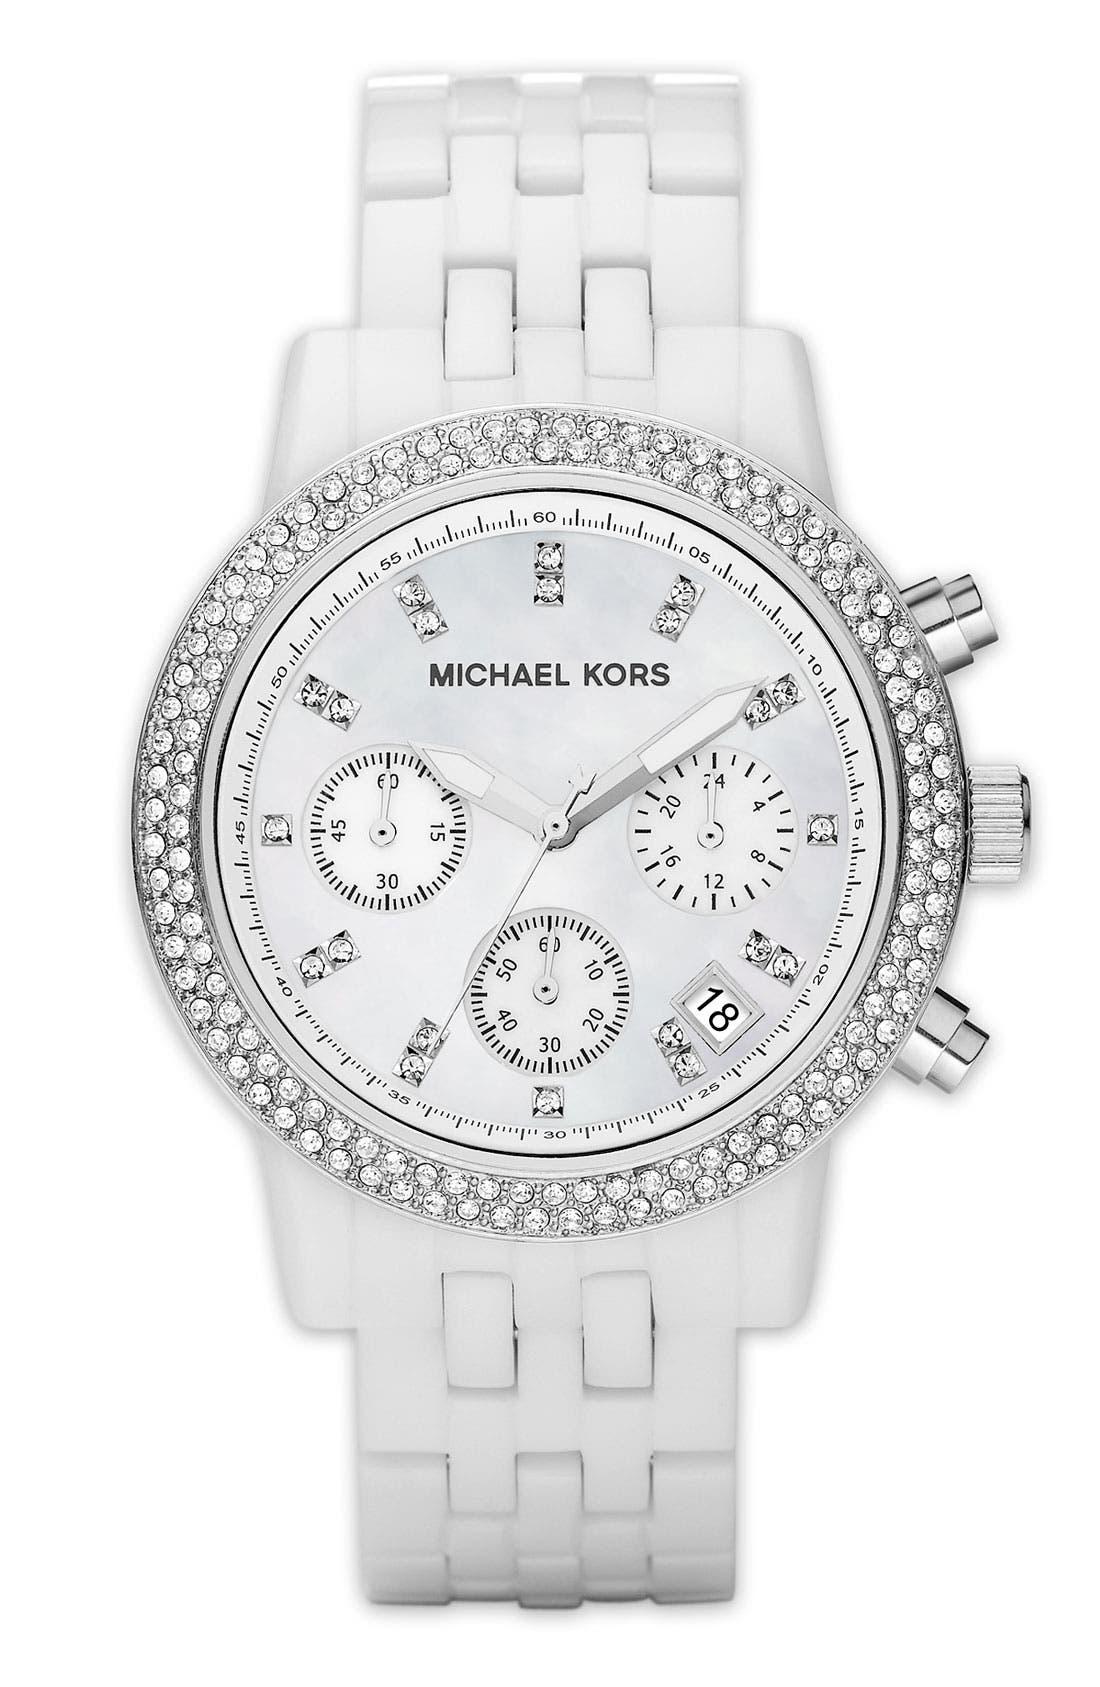 Main Image - Michael Kors Resin & Crystal Topring Watch